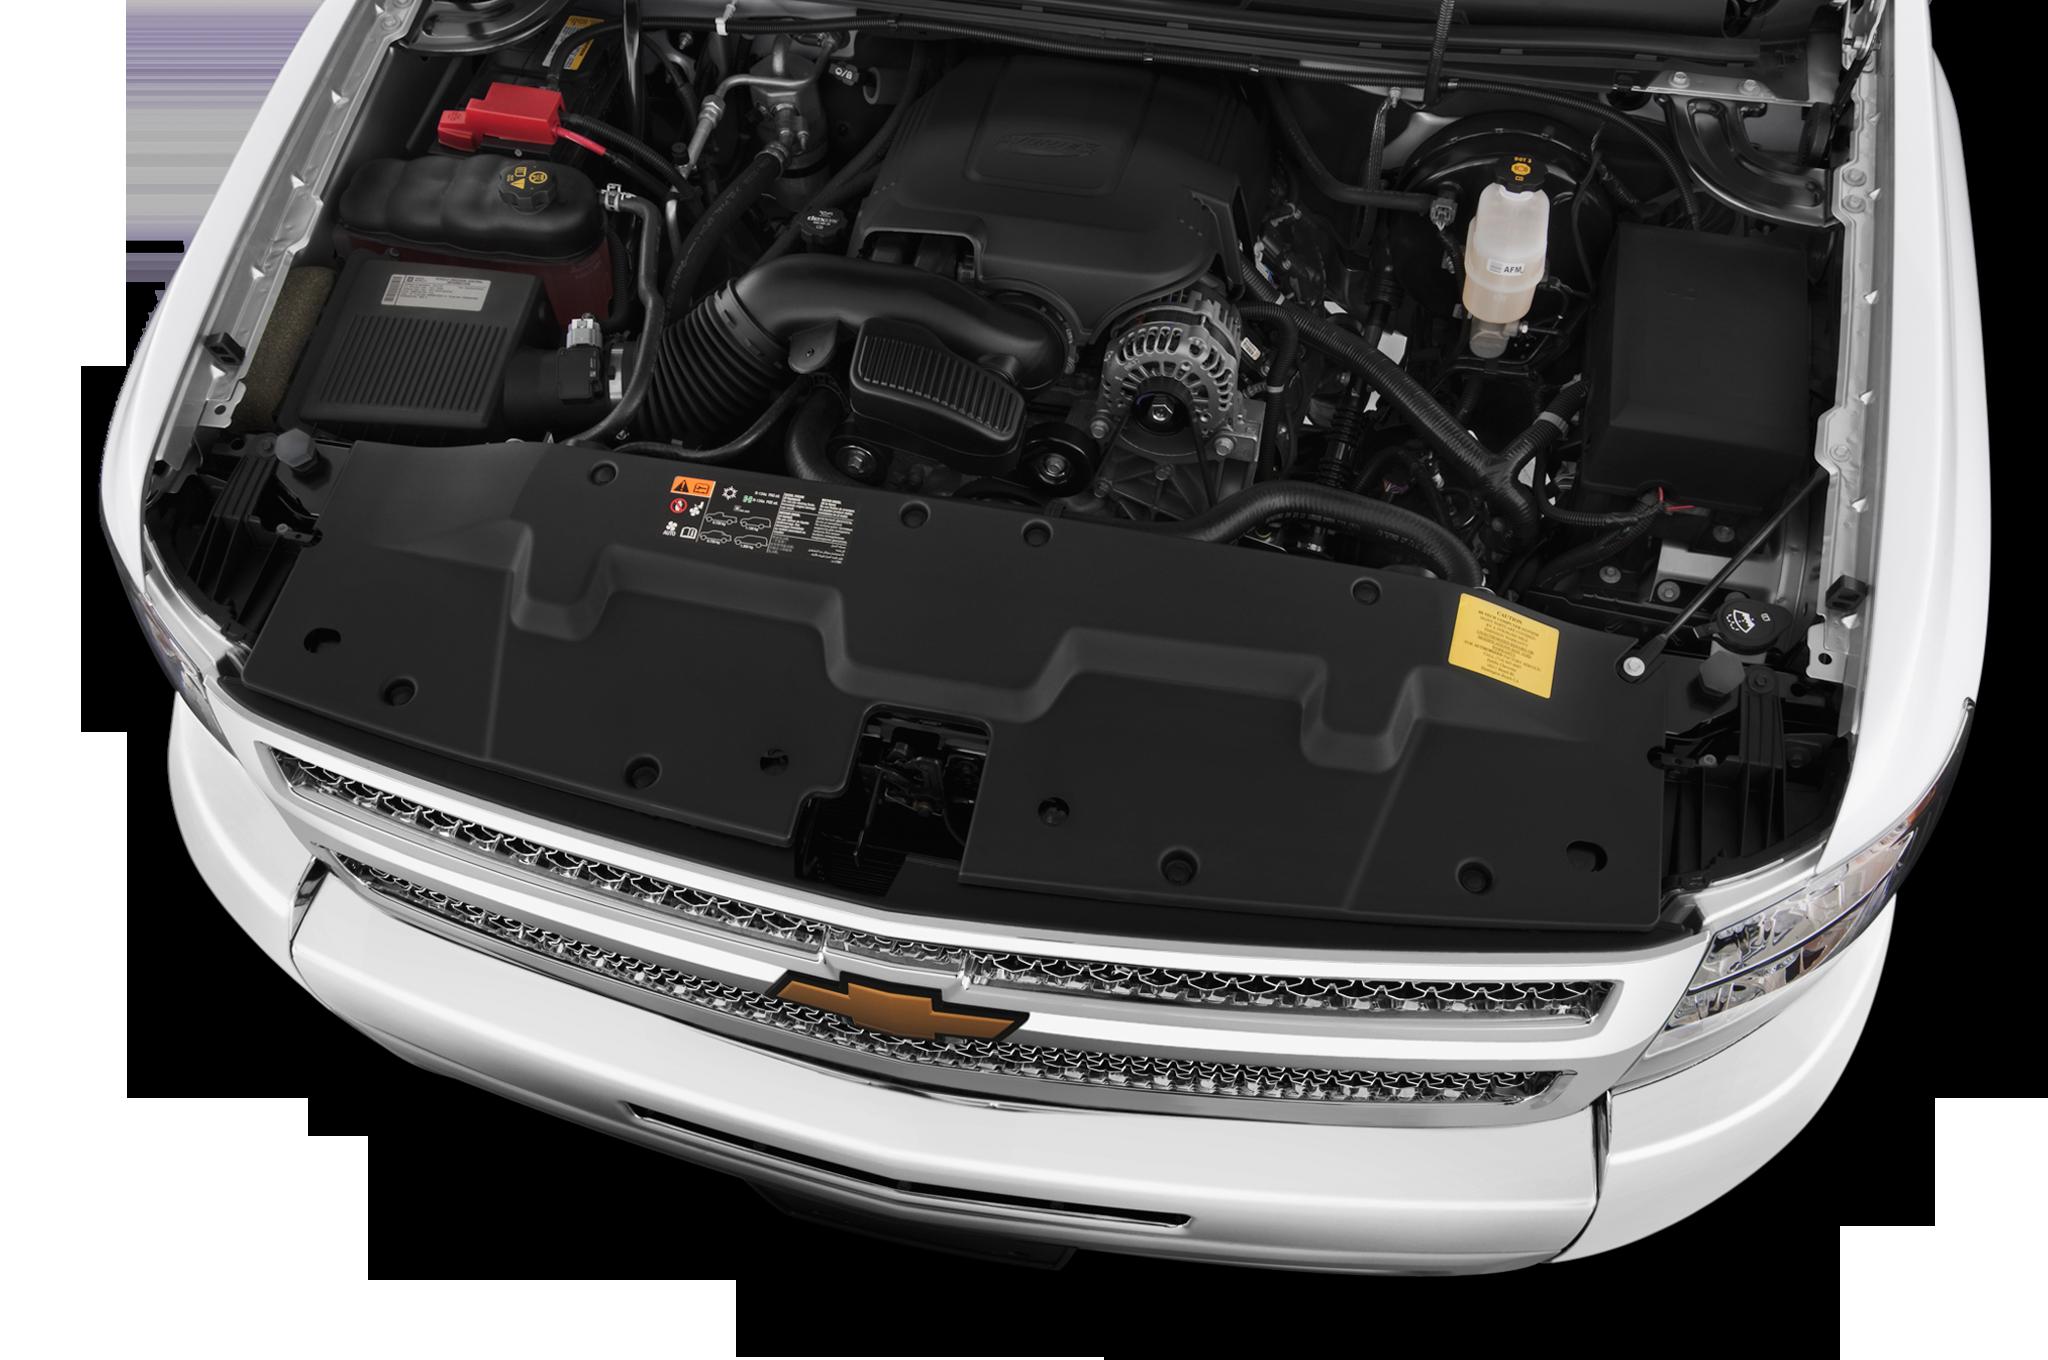 Chevrolet Partners With Realtree For Camoed Silverado Sema Concept 2009 Afm Engine Diagram 80 158